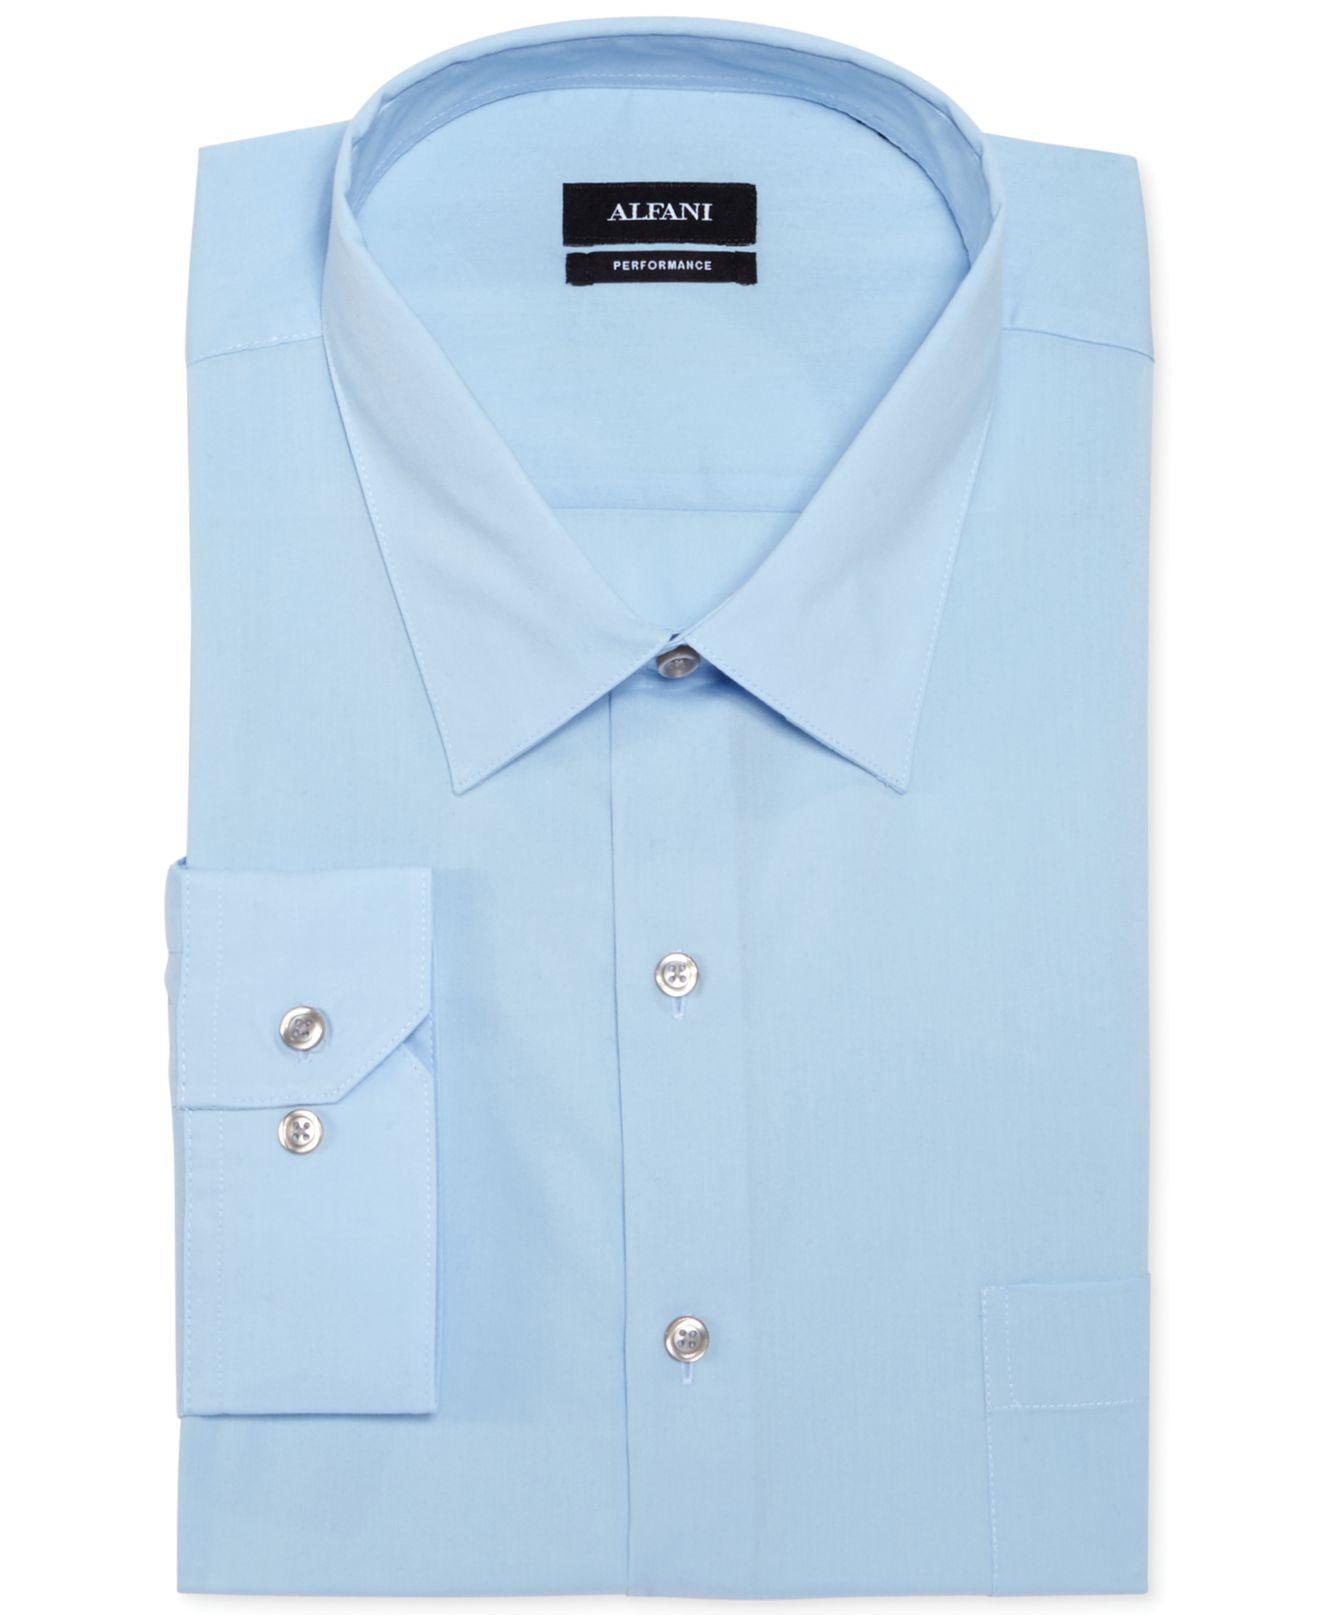 Alfani men 39 s classic regular fit performance stretch blue for Big and tall french cuff dress shirts